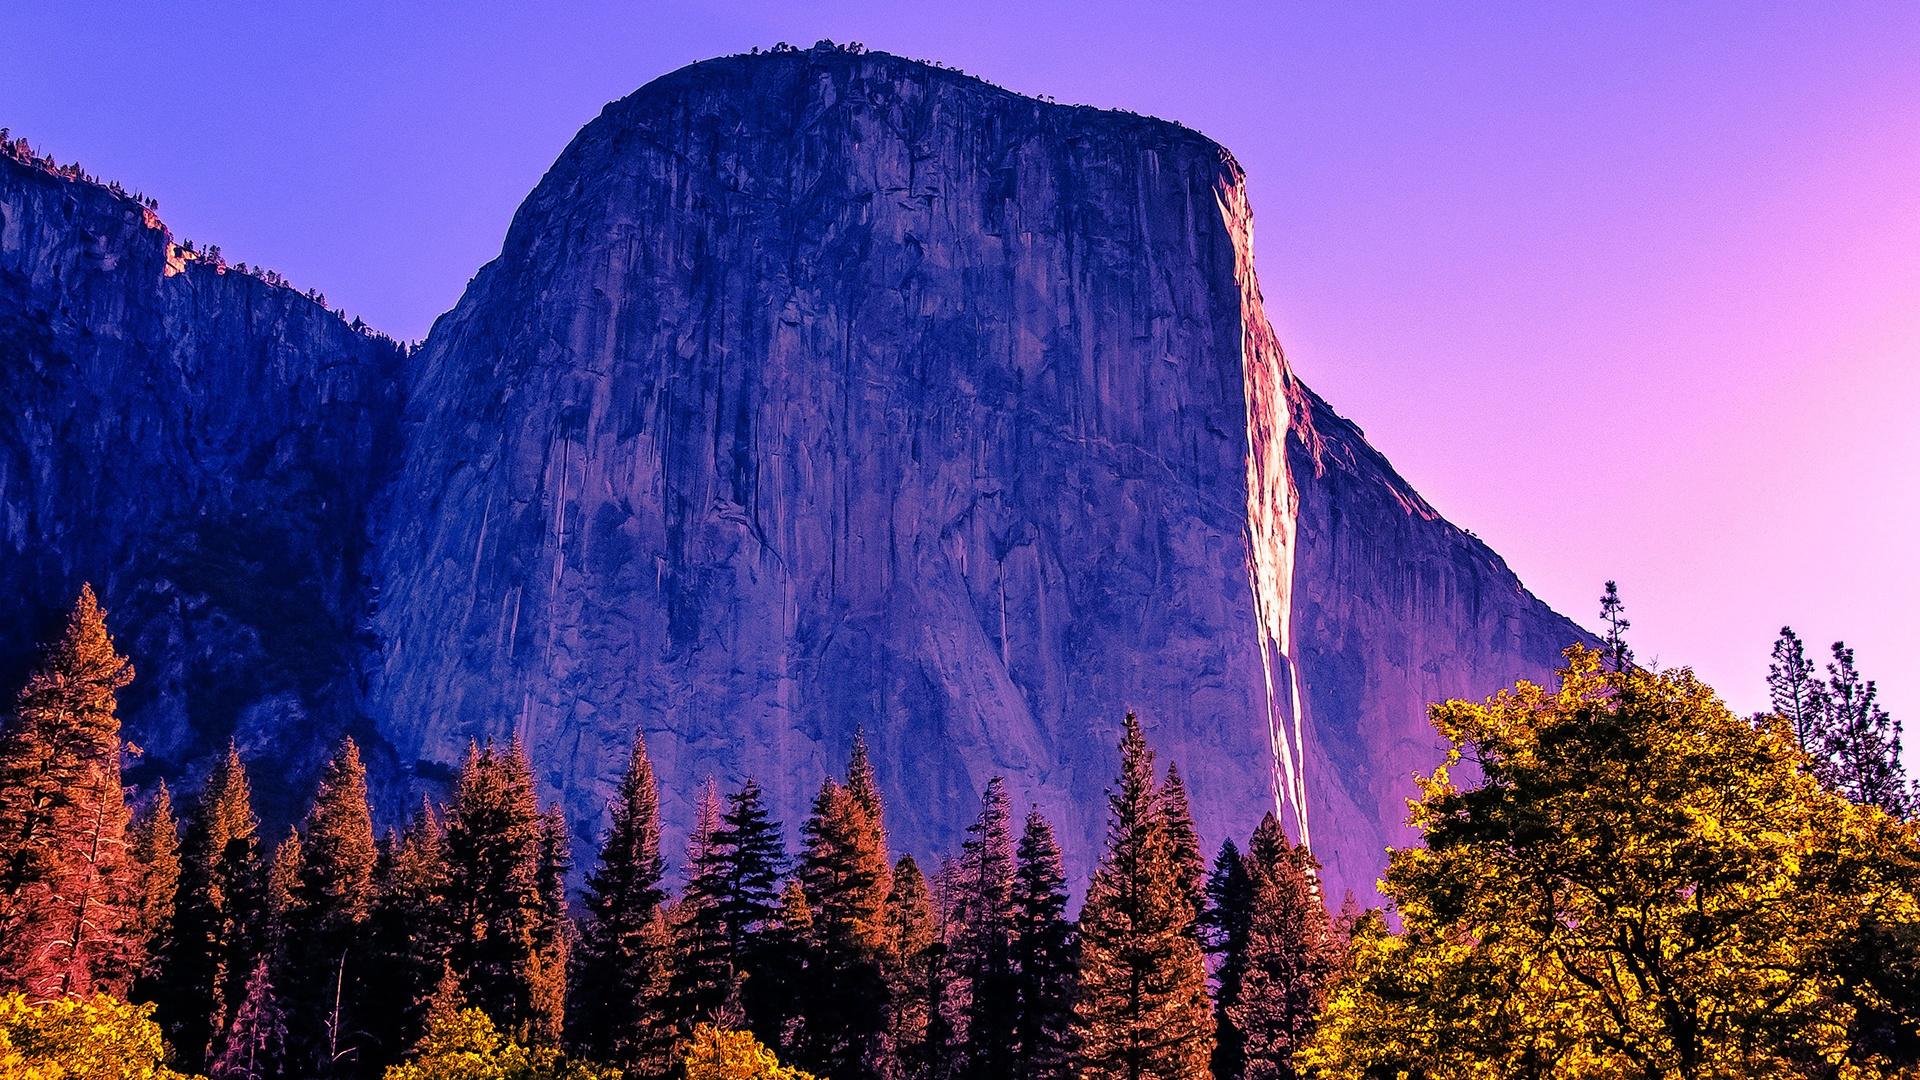 Wallpaper California Trees Rocks Mountains Yosemite